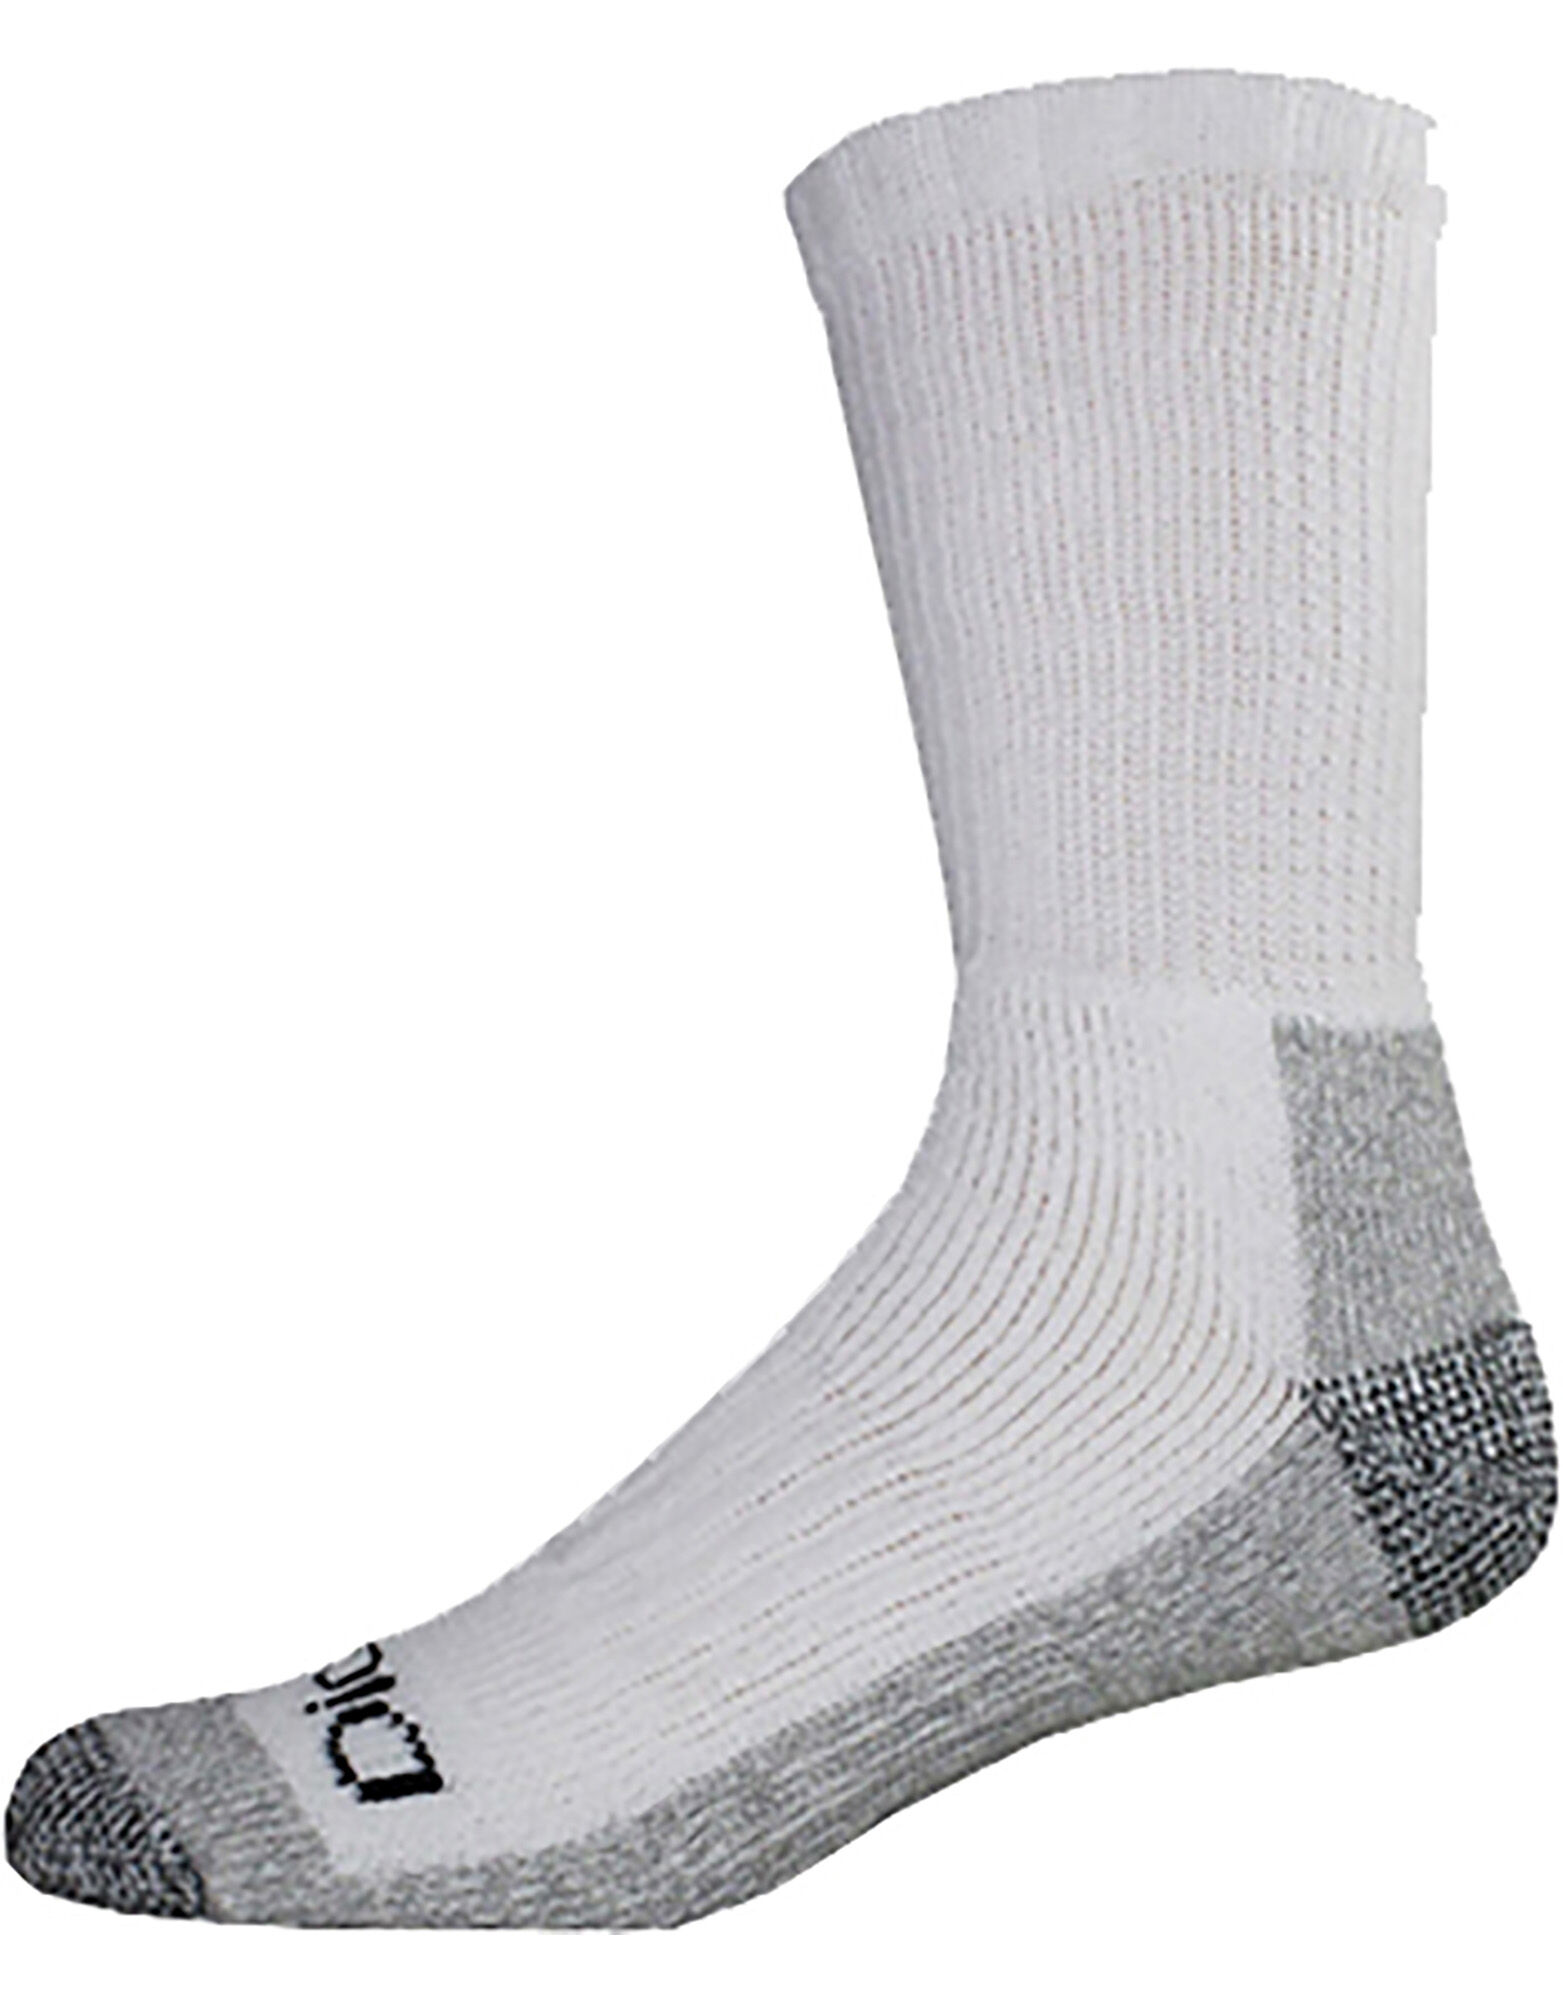 White Acrylic Mens Crew Socks